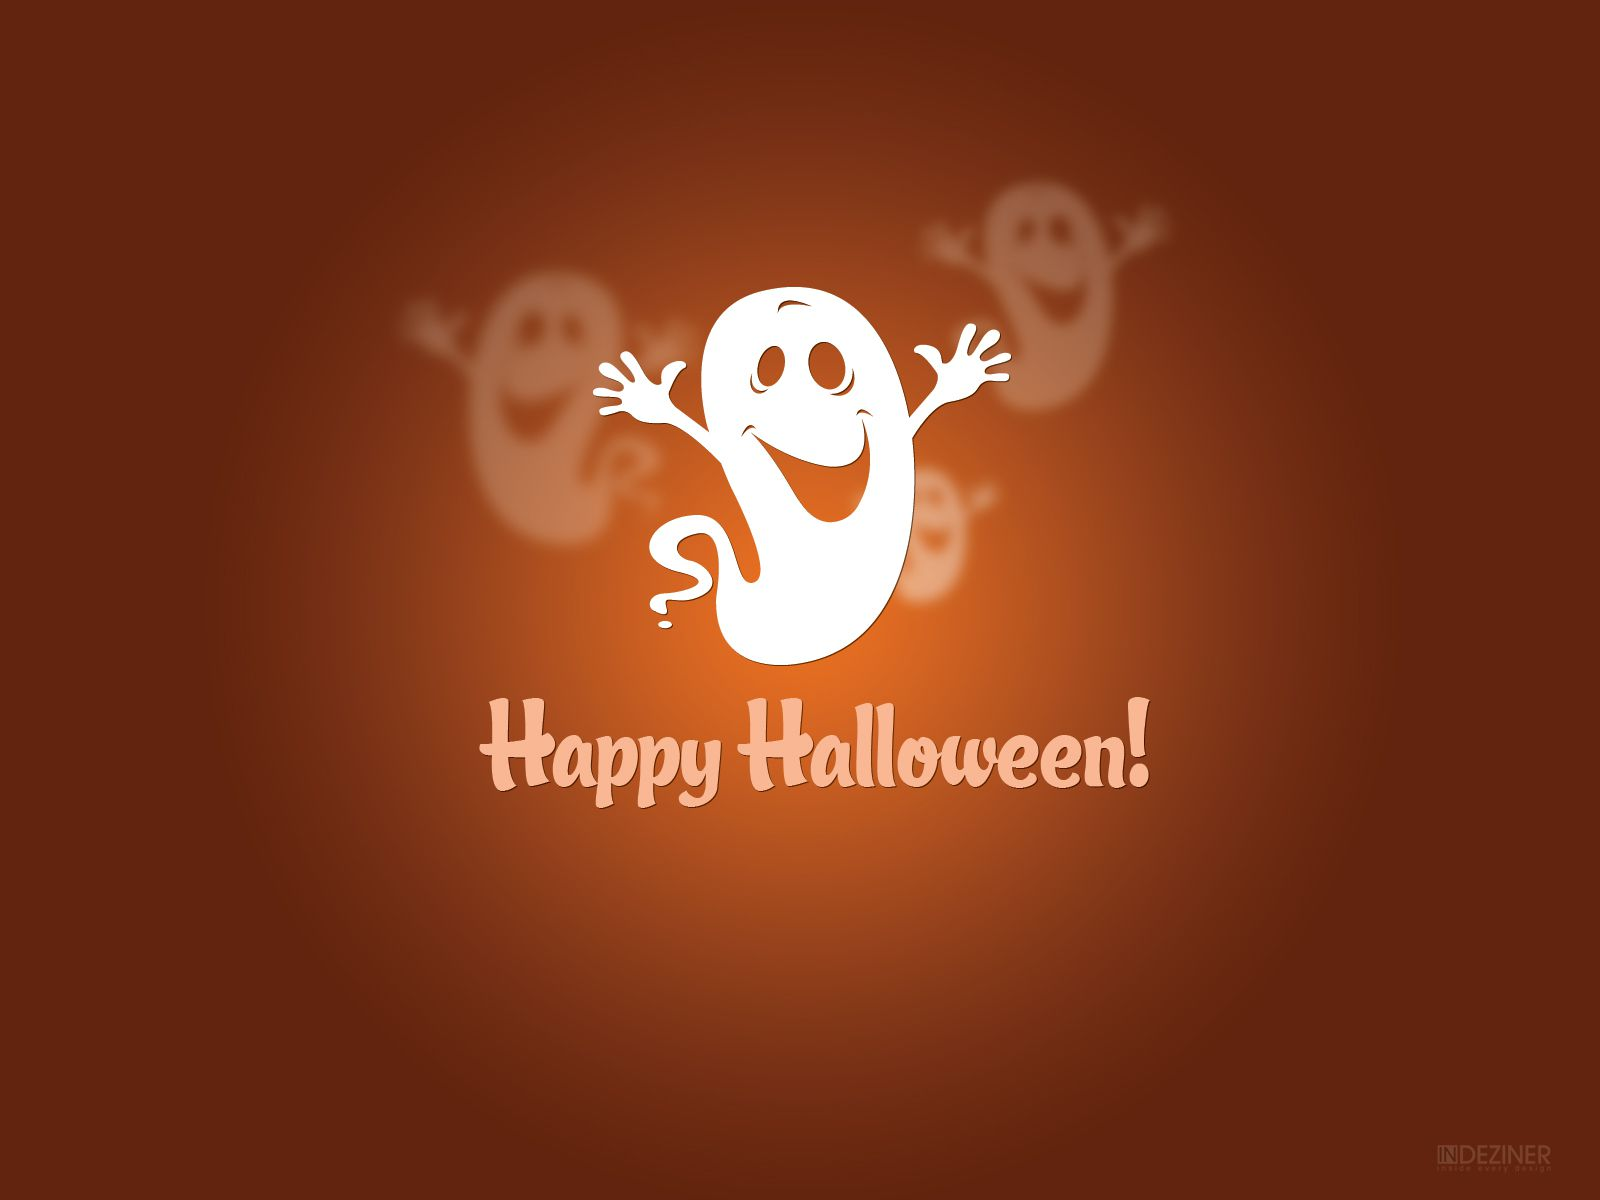 45 Best Spooky And Fun Halloween Wallpapers